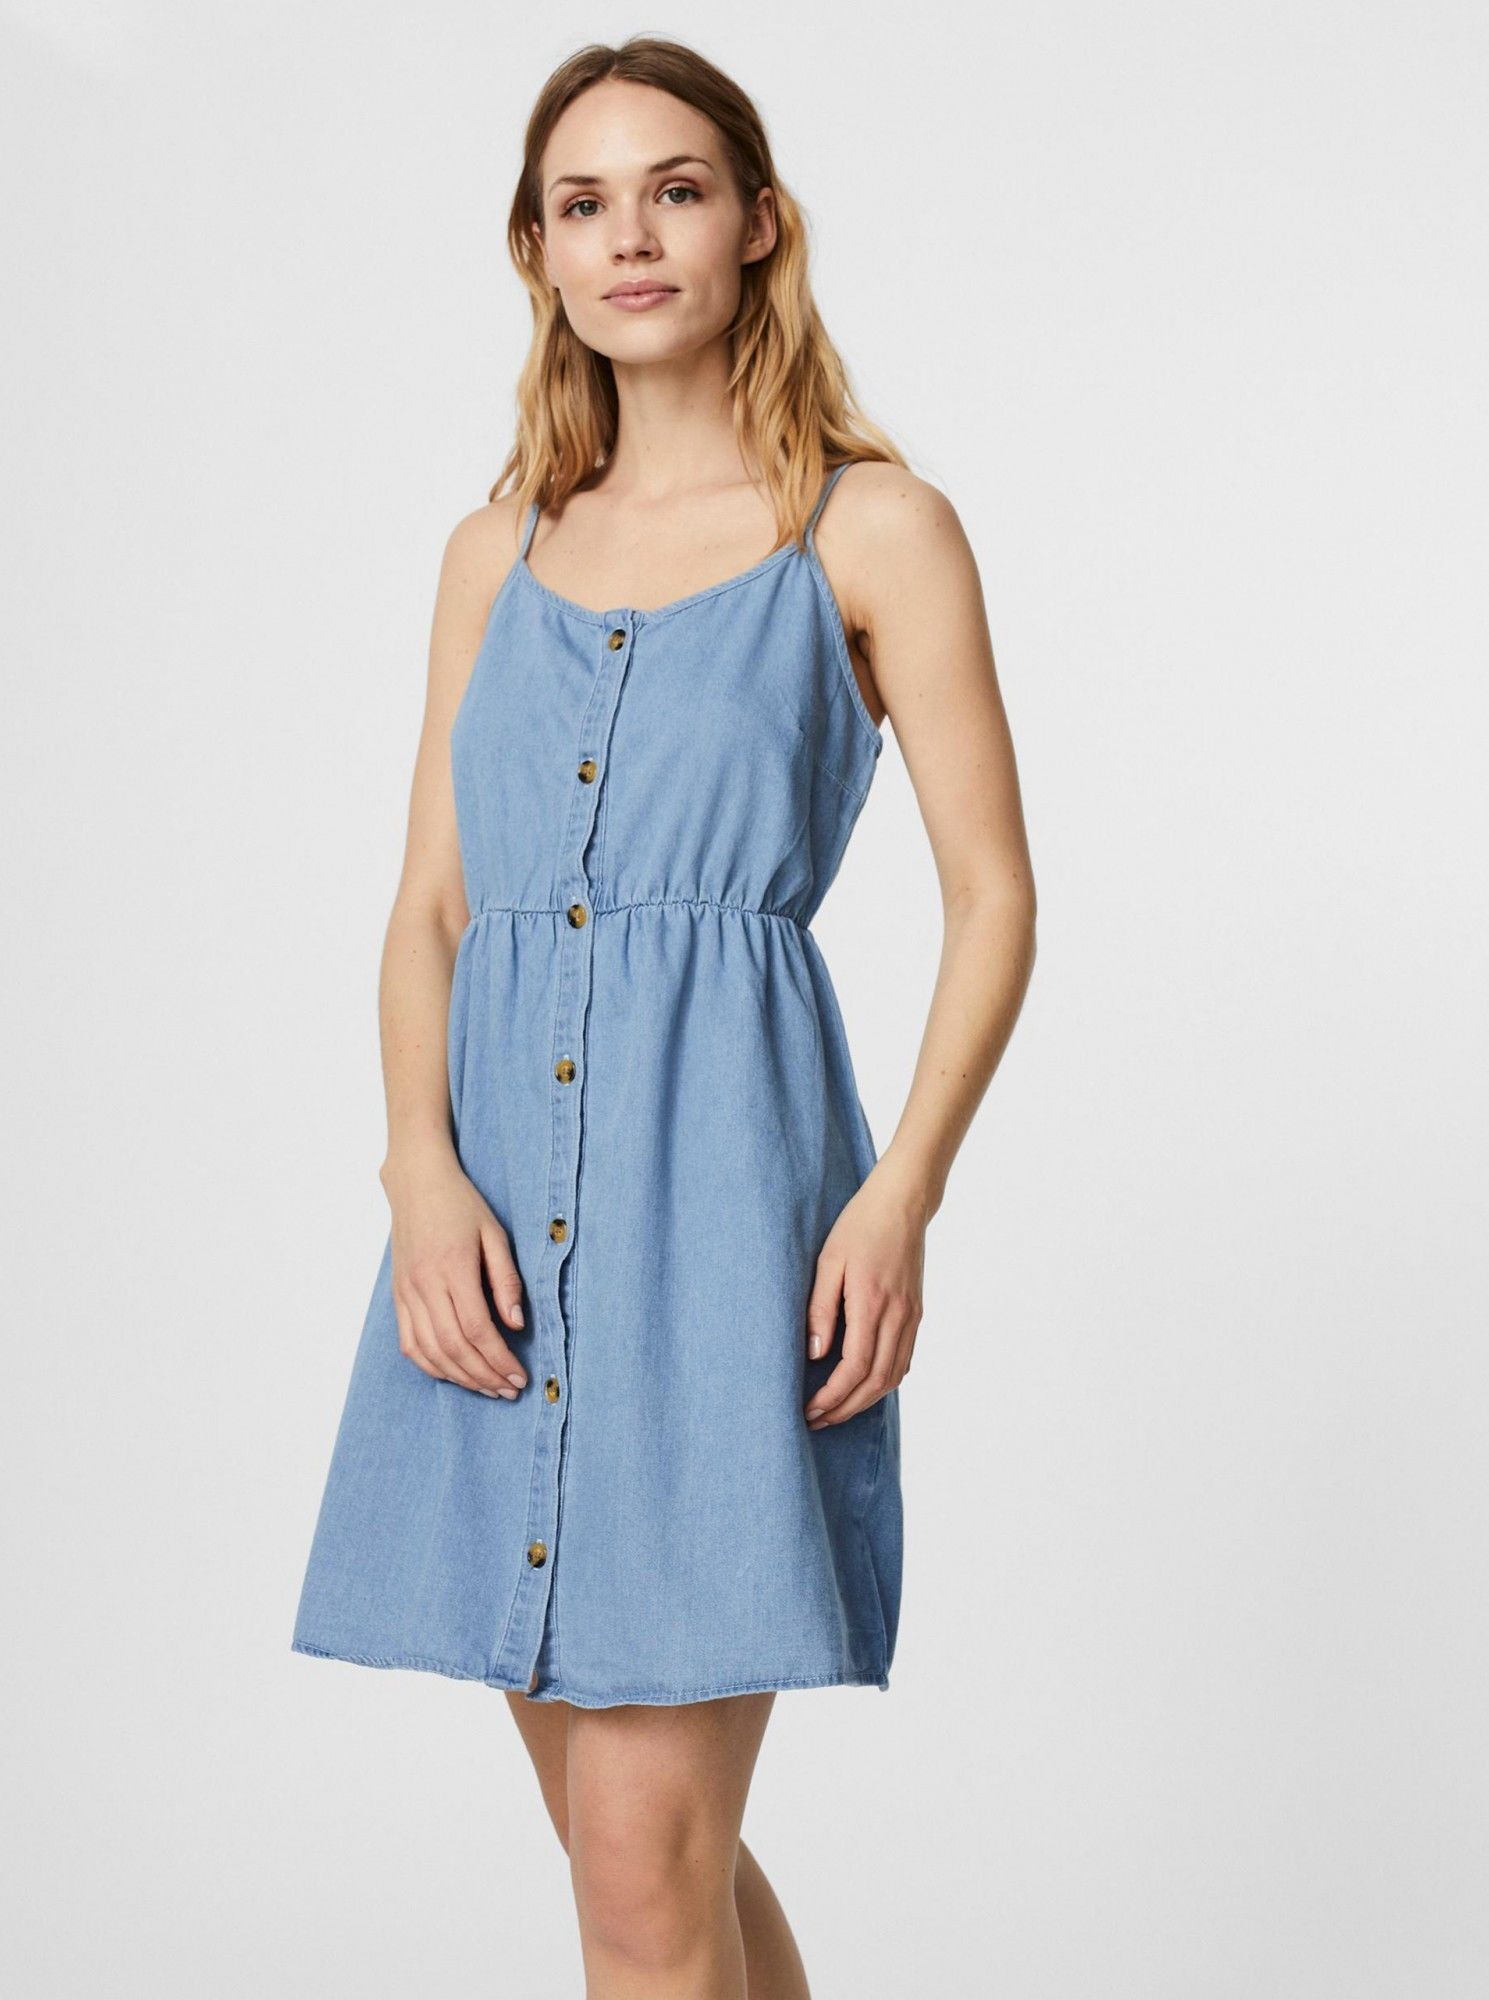 Vero Moda niebieski dżinsowa sukienka Flicka